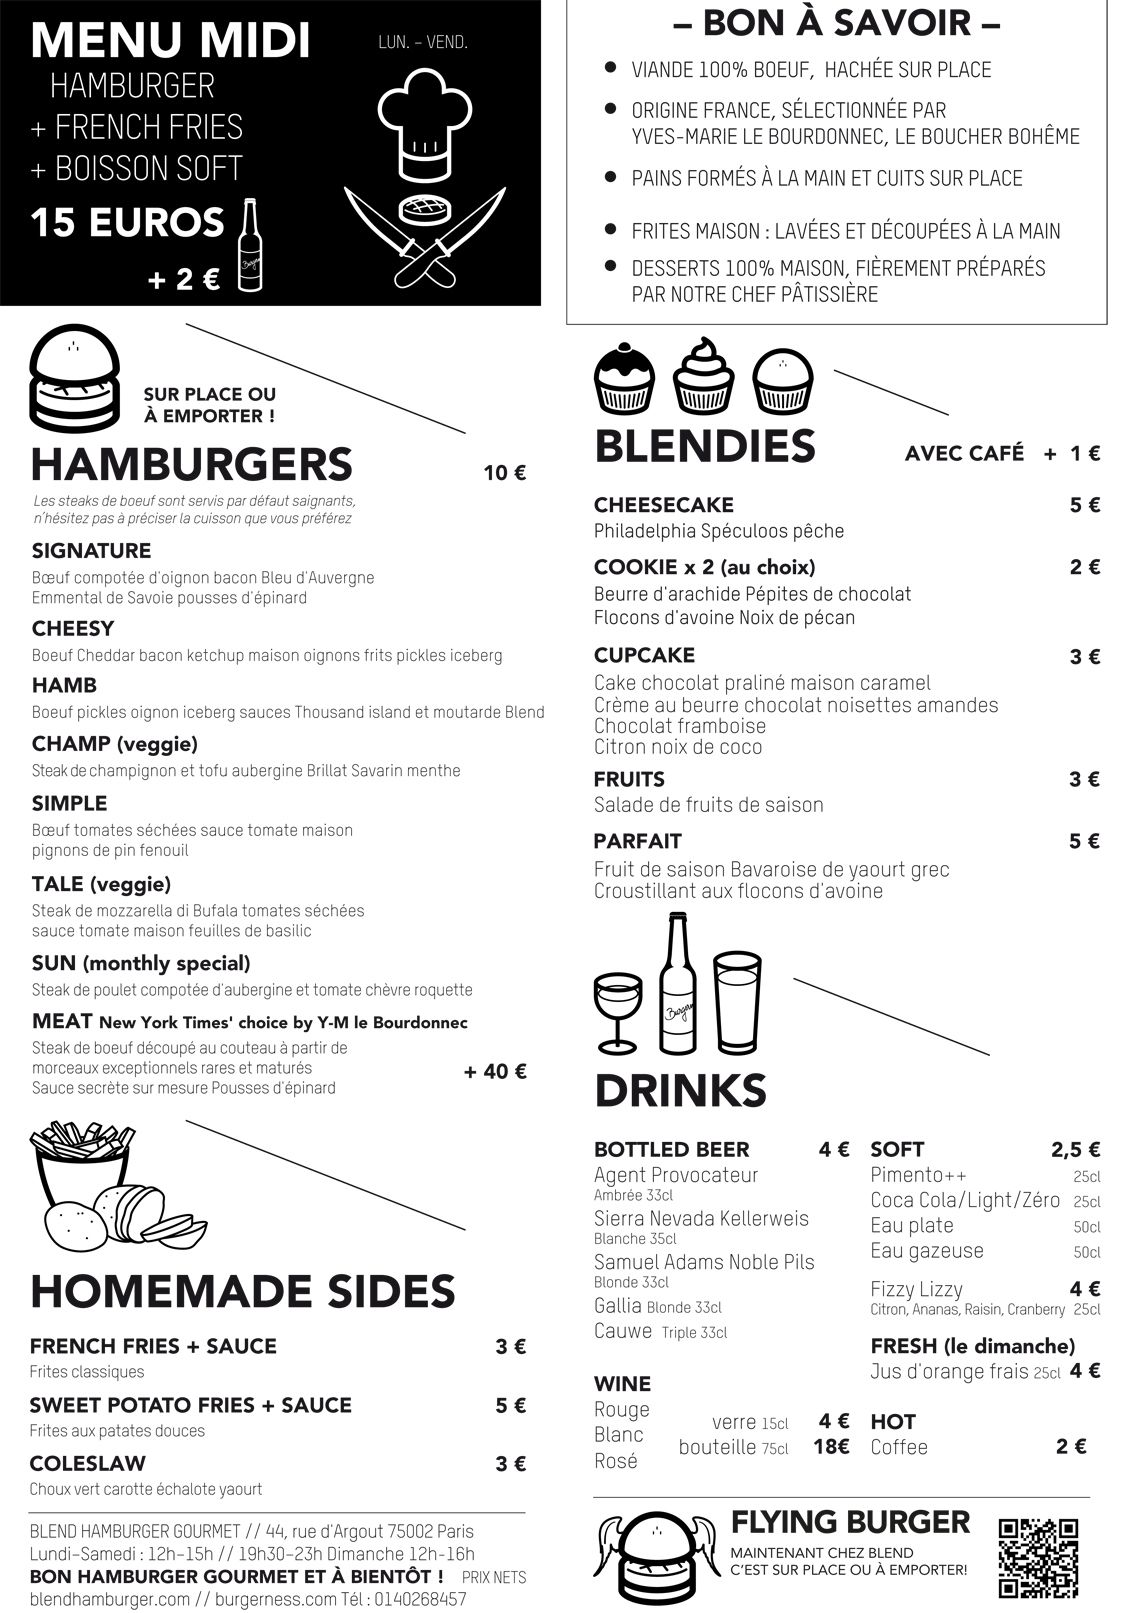 Blend Burger Paris Carte Restaurant Menu Resto Boisson Soft